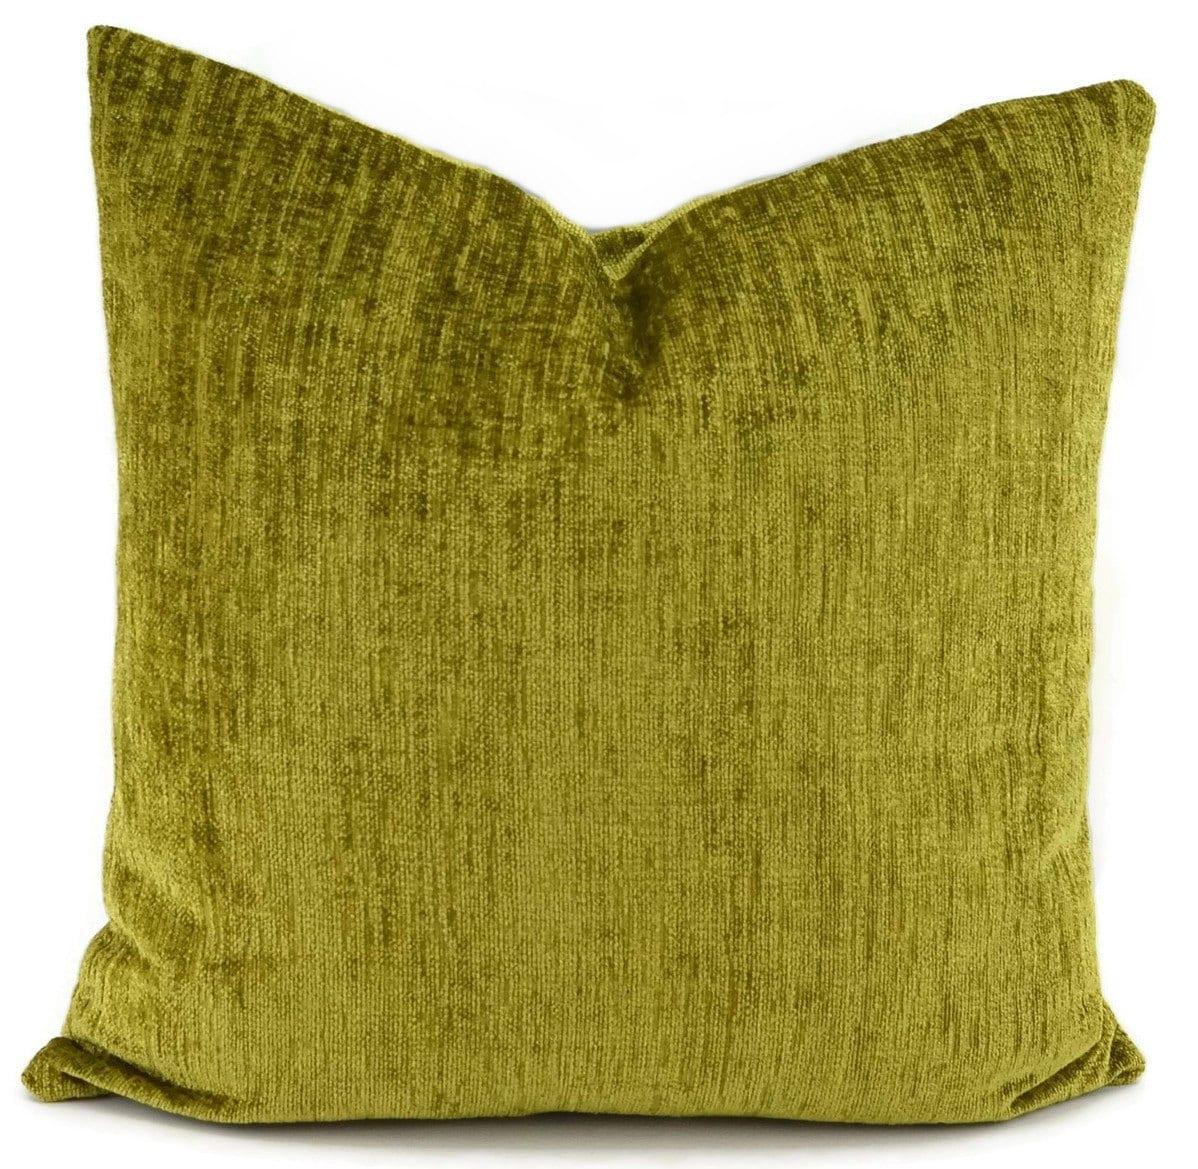 Green Chenille Throw Pillow Cover Lime Green Chenille Lumbar